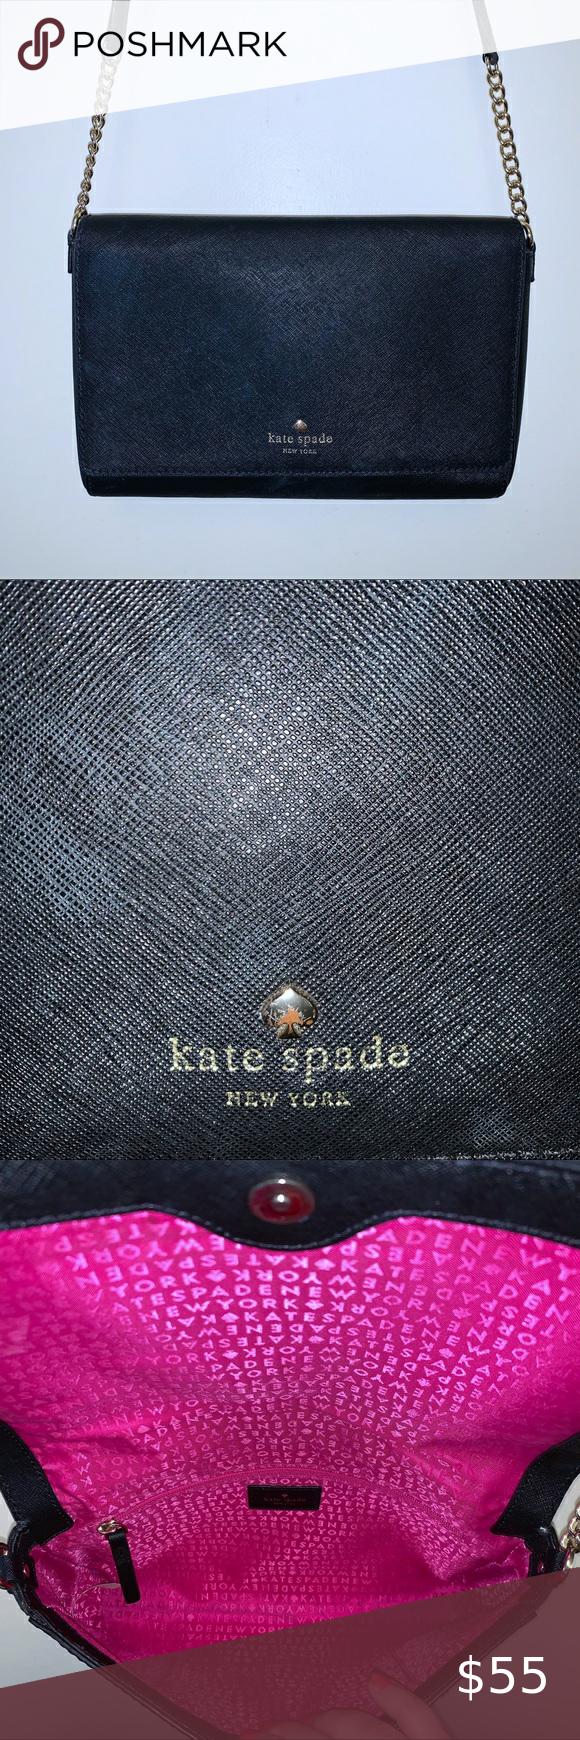 Kate Spade Nueva York Kate Spade Logo Kate Spade Kate Spade Style